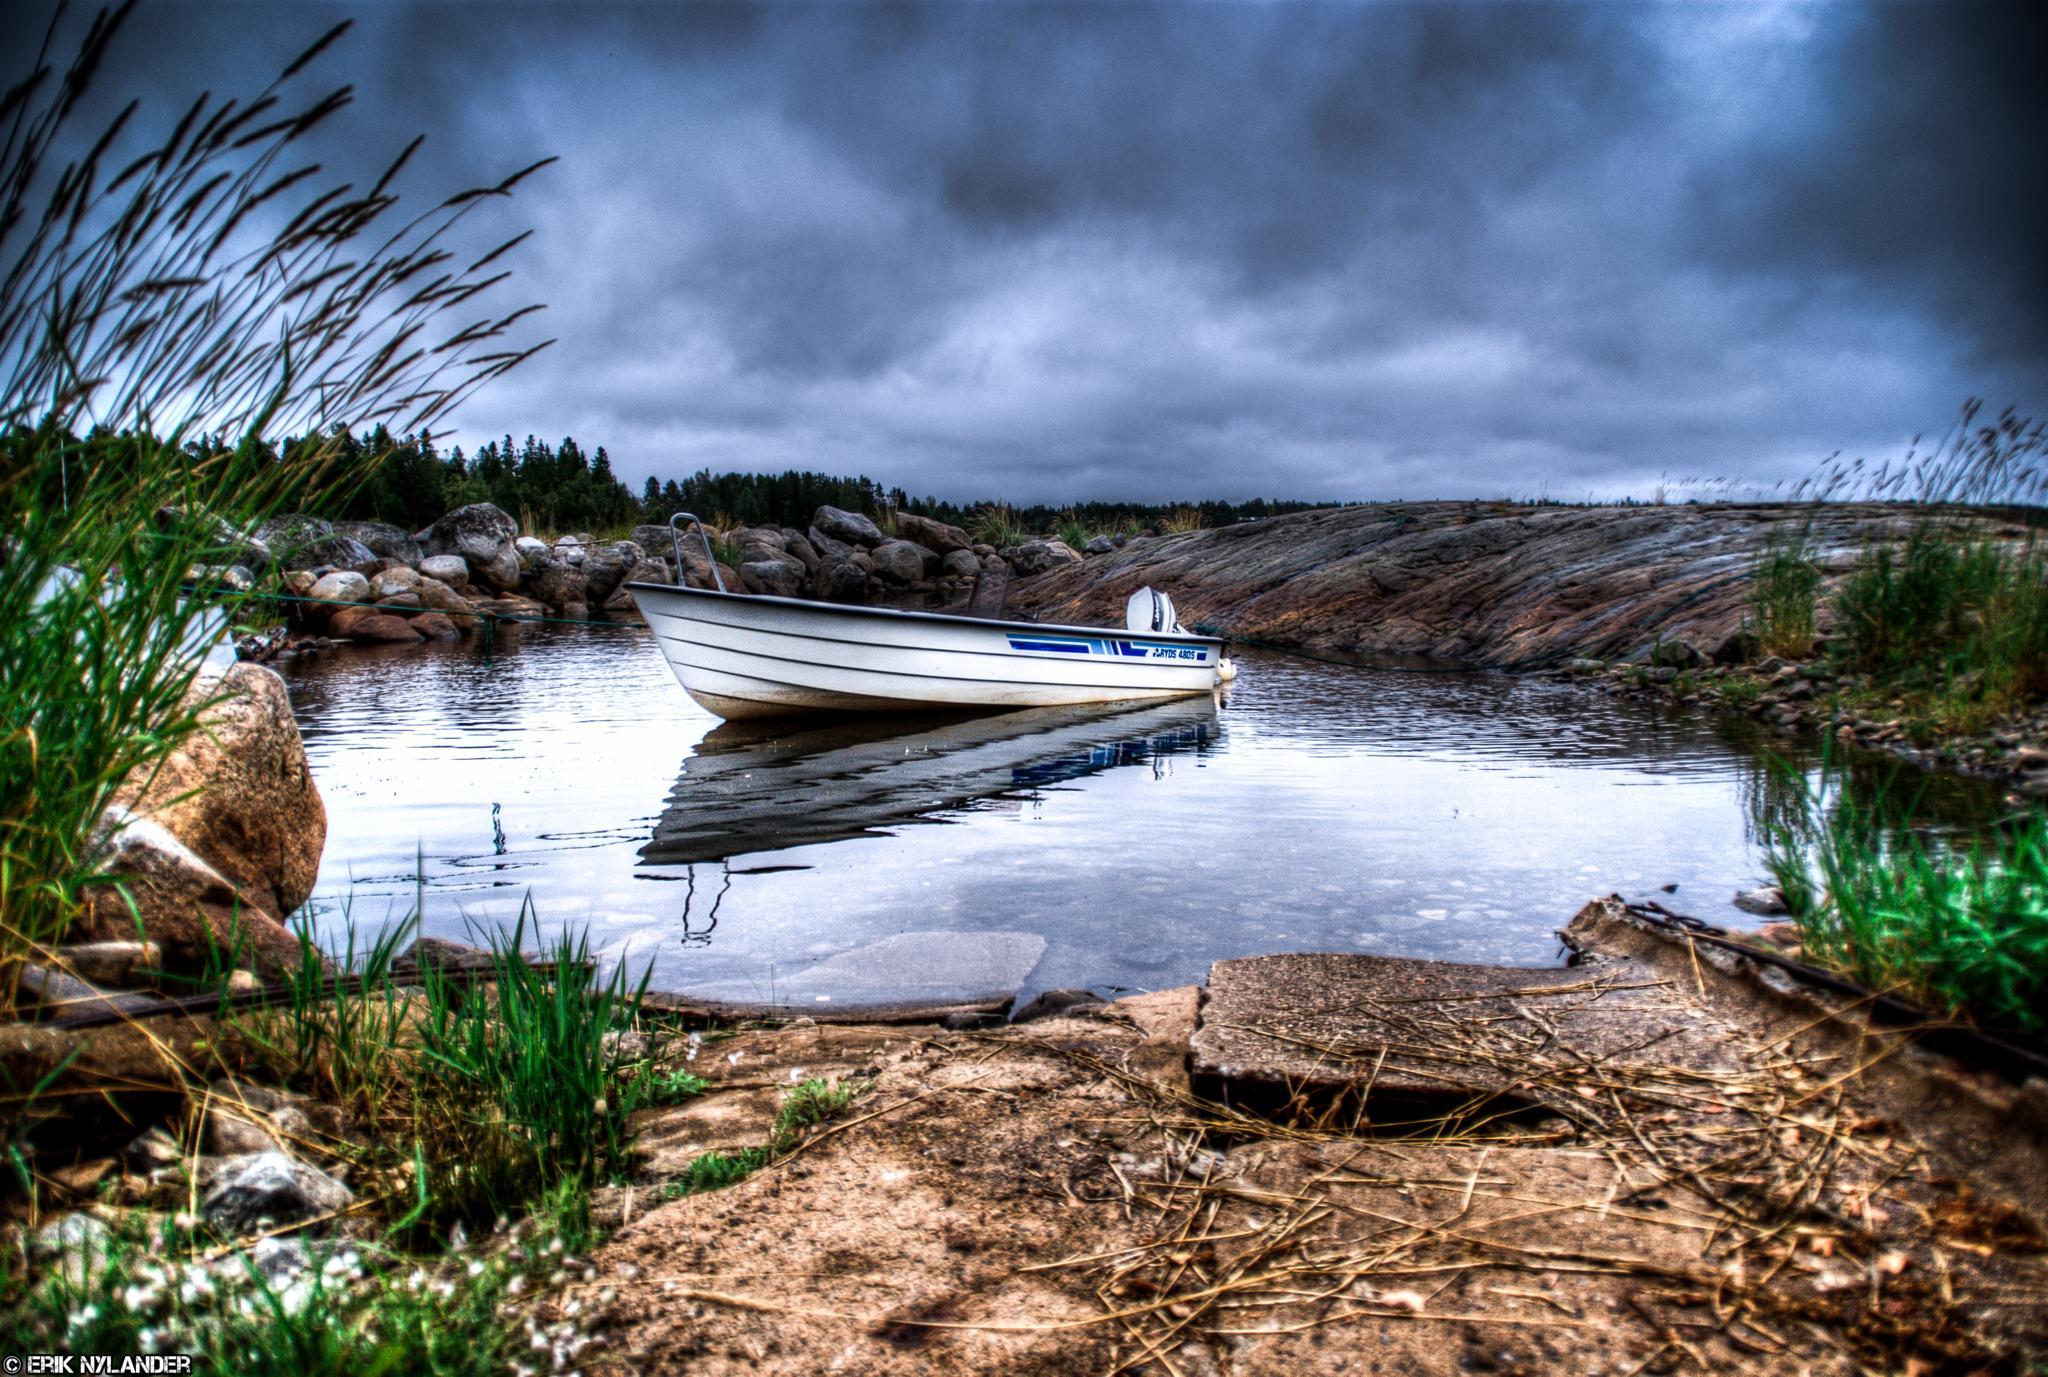 Tranquility by Erik Nylander